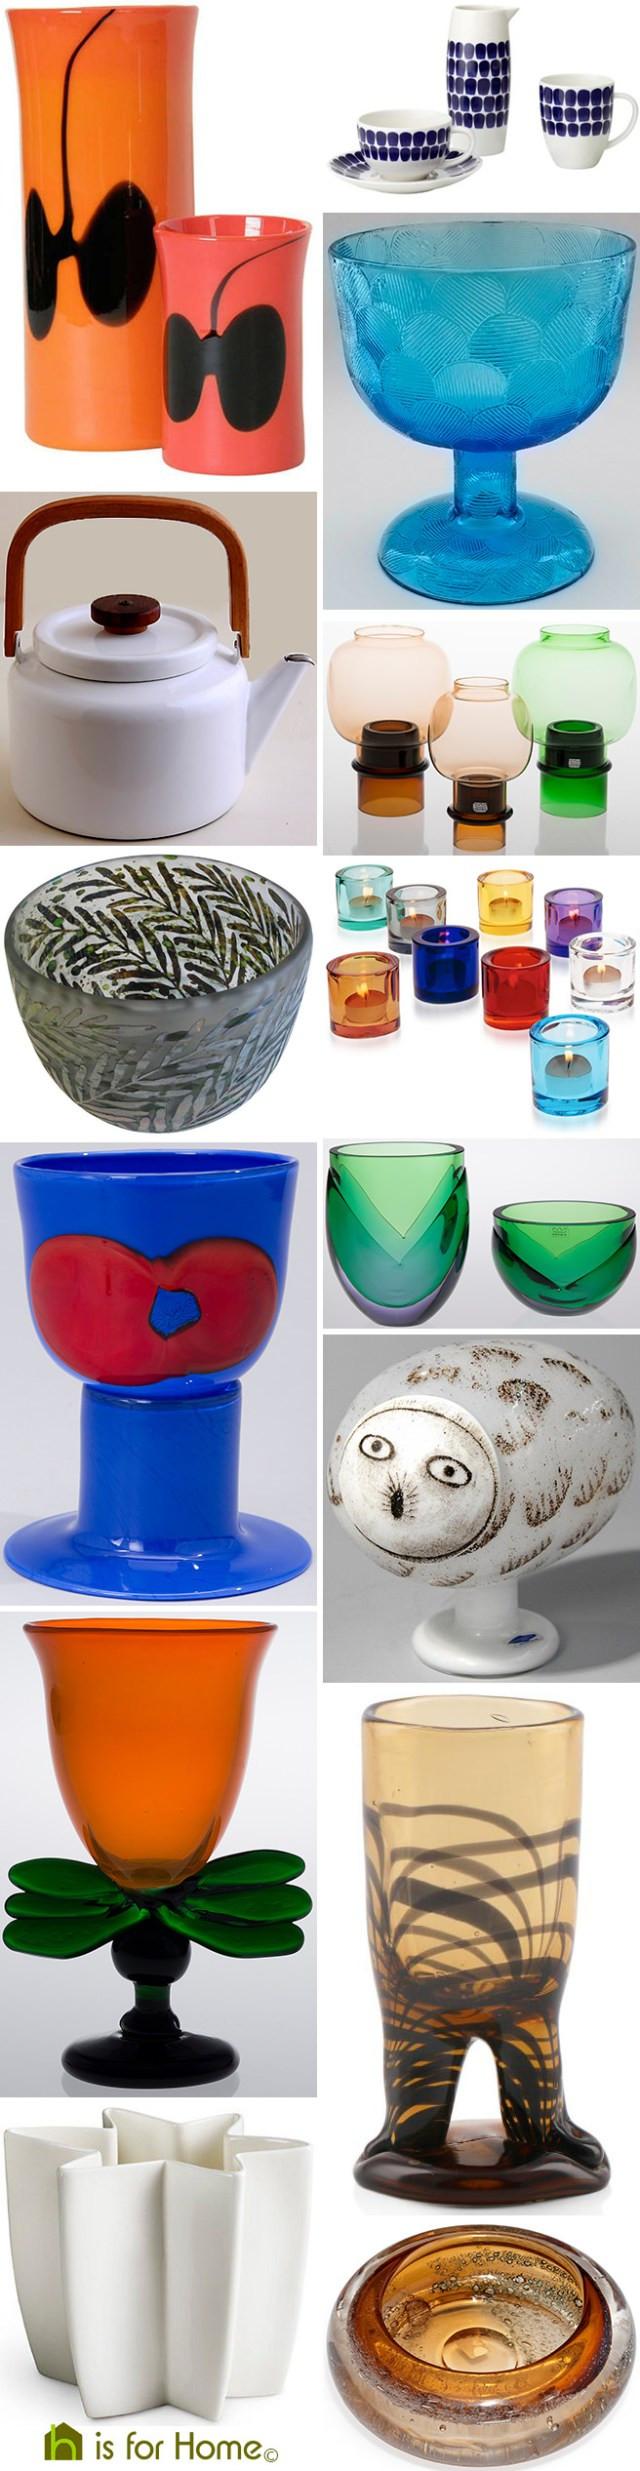 kosta boda saraband vase of glass archives h is for home harbinger pertaining to designer desire heikki orvola